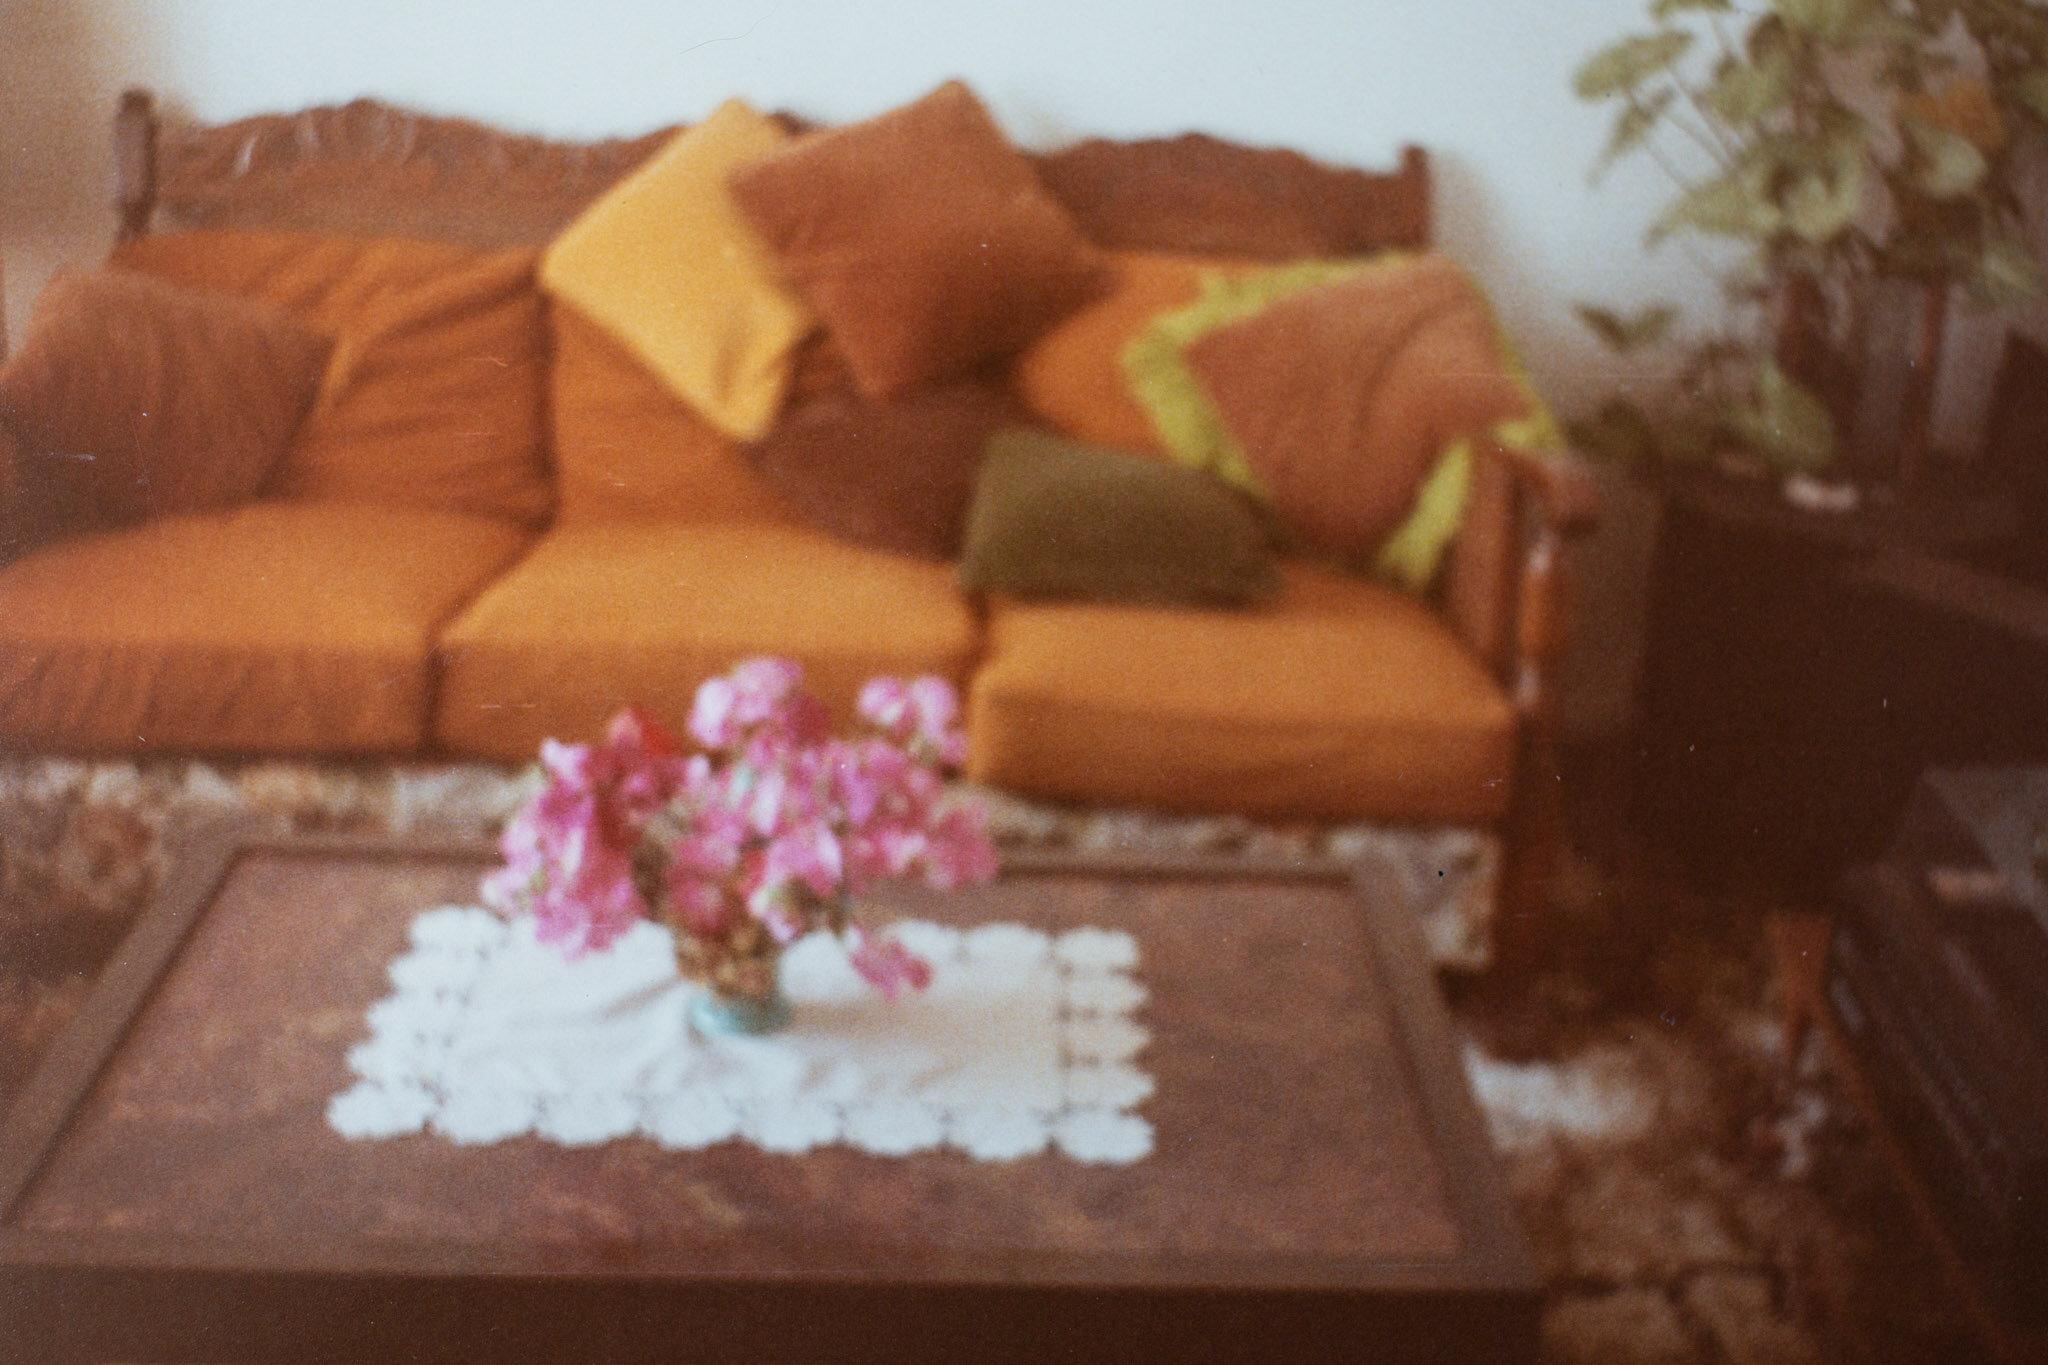 film-photo-XII (1 of 1).jpg